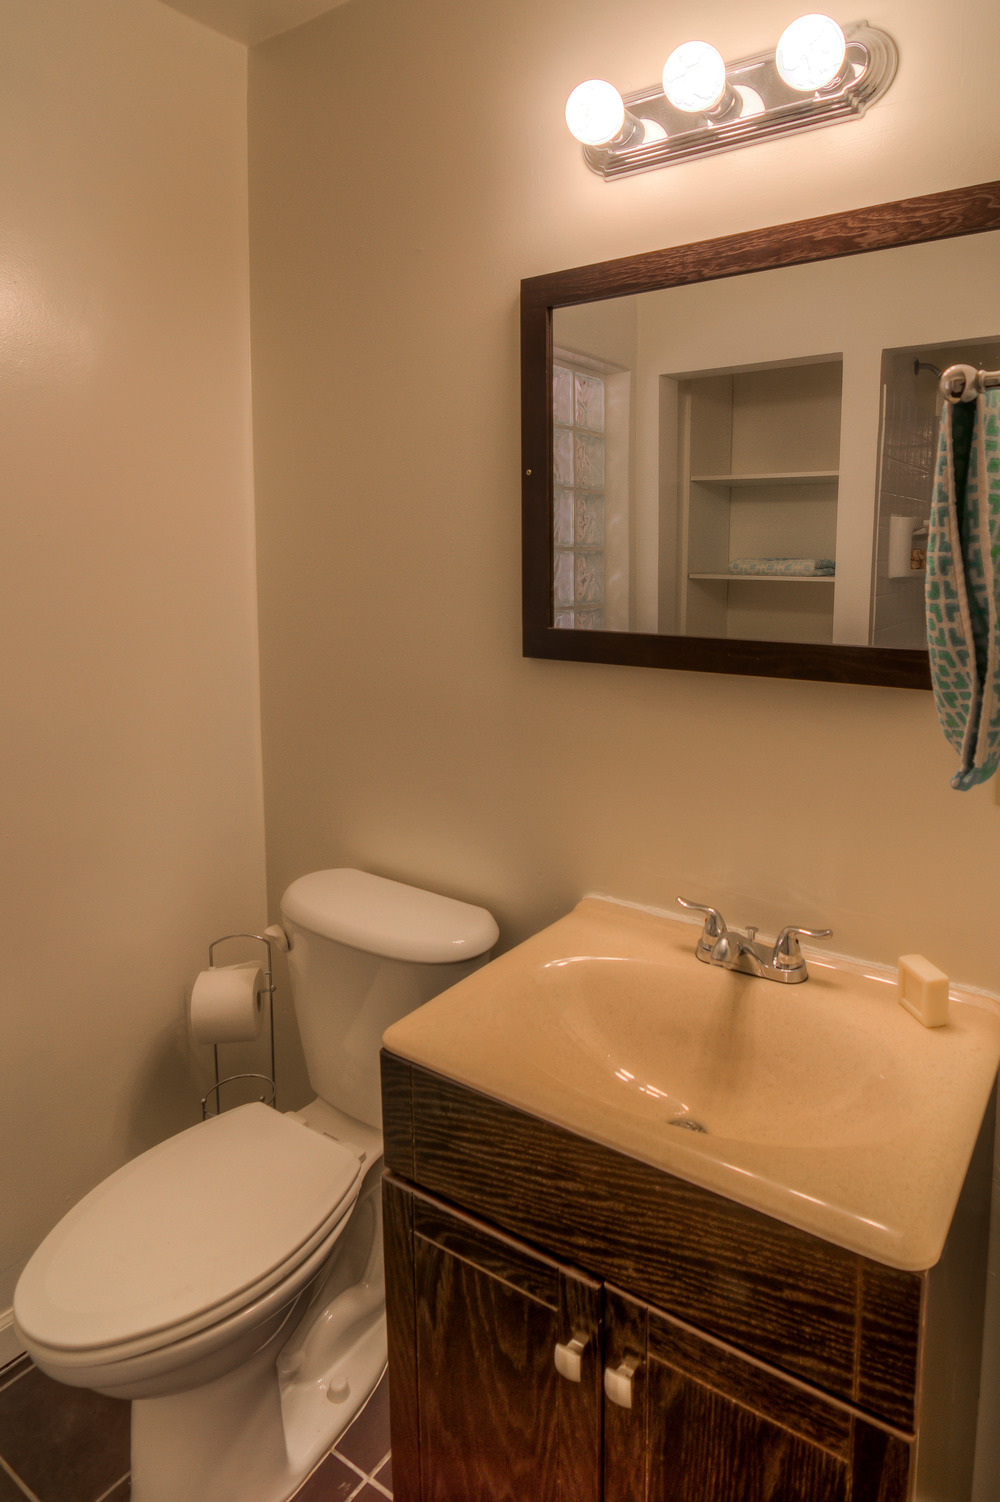 24 Bathroom 1 photo c.jpg